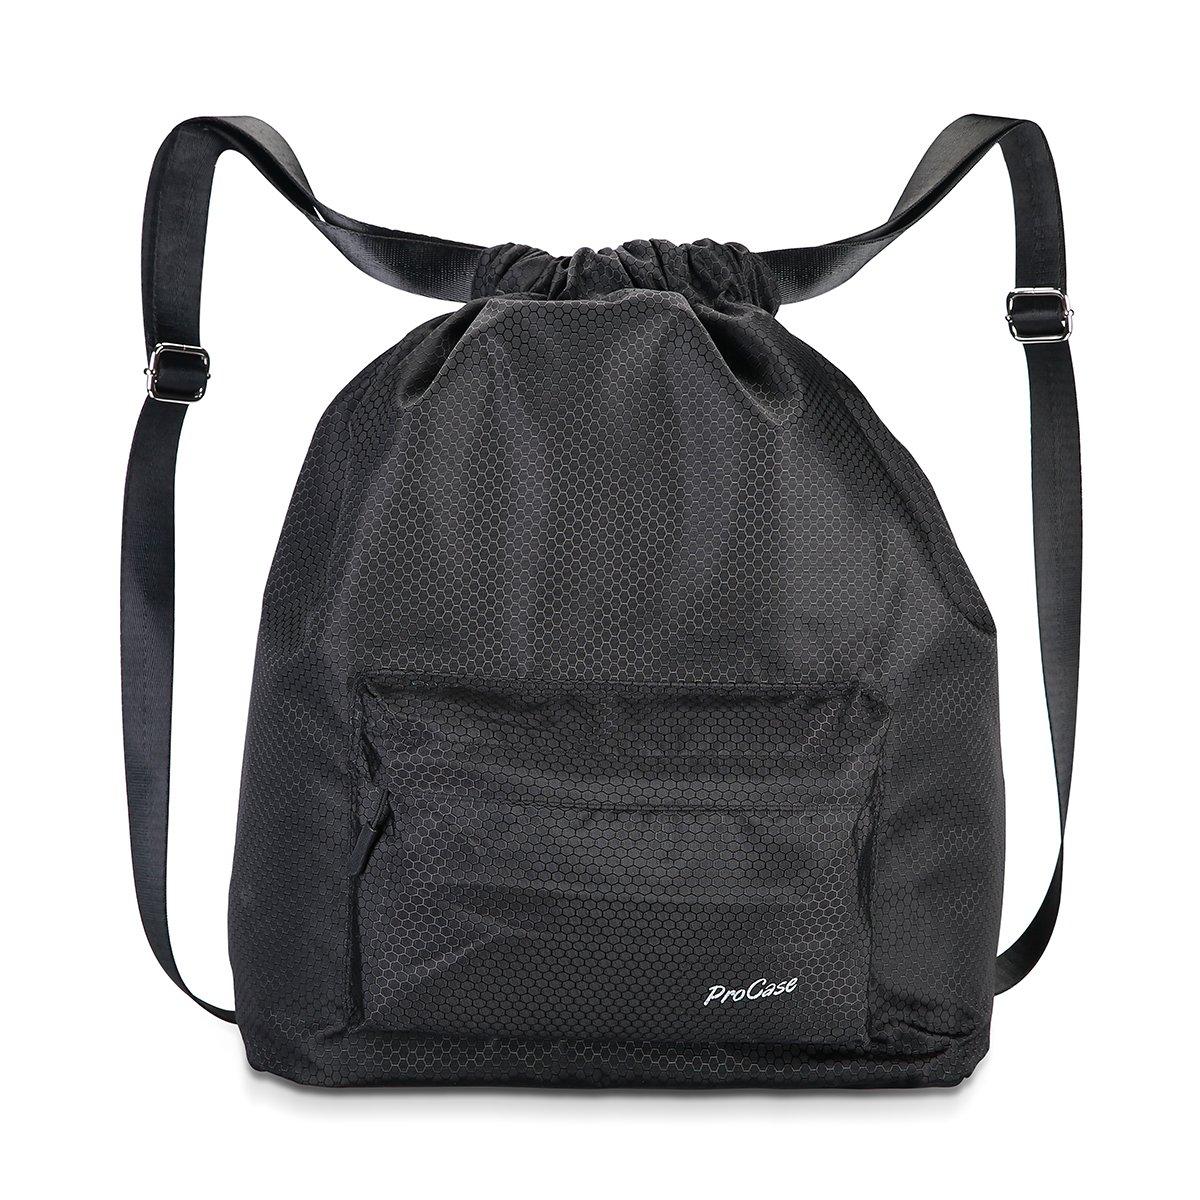 ProCase 游泳袋 健身房袋 防水抽绳背包 男女皆宜的运动装备袋 适合游泳、冲浪、热泉、旅行、徒步和露营 - 黑色